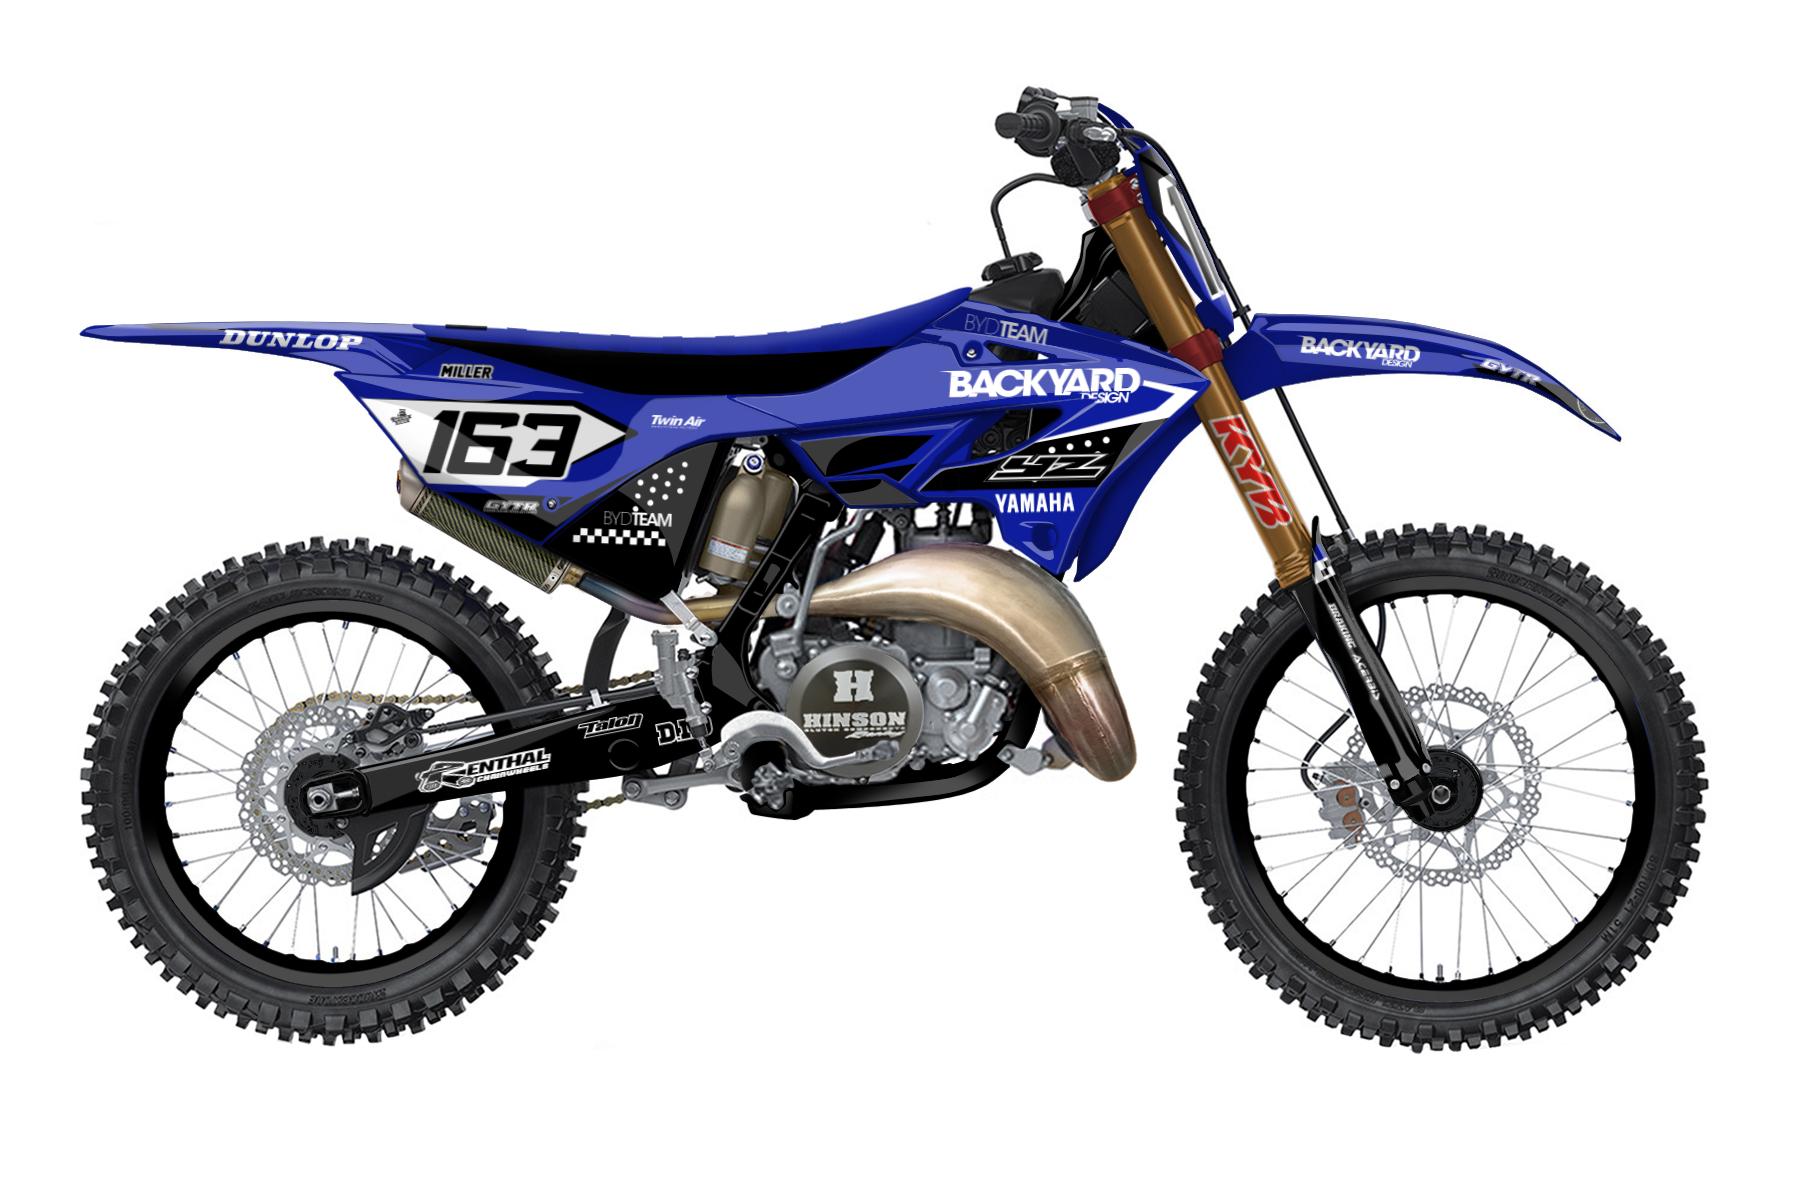 Yamaha YZ 250 - 2022 - Backyard Design - Mx Dekor - Feature Design